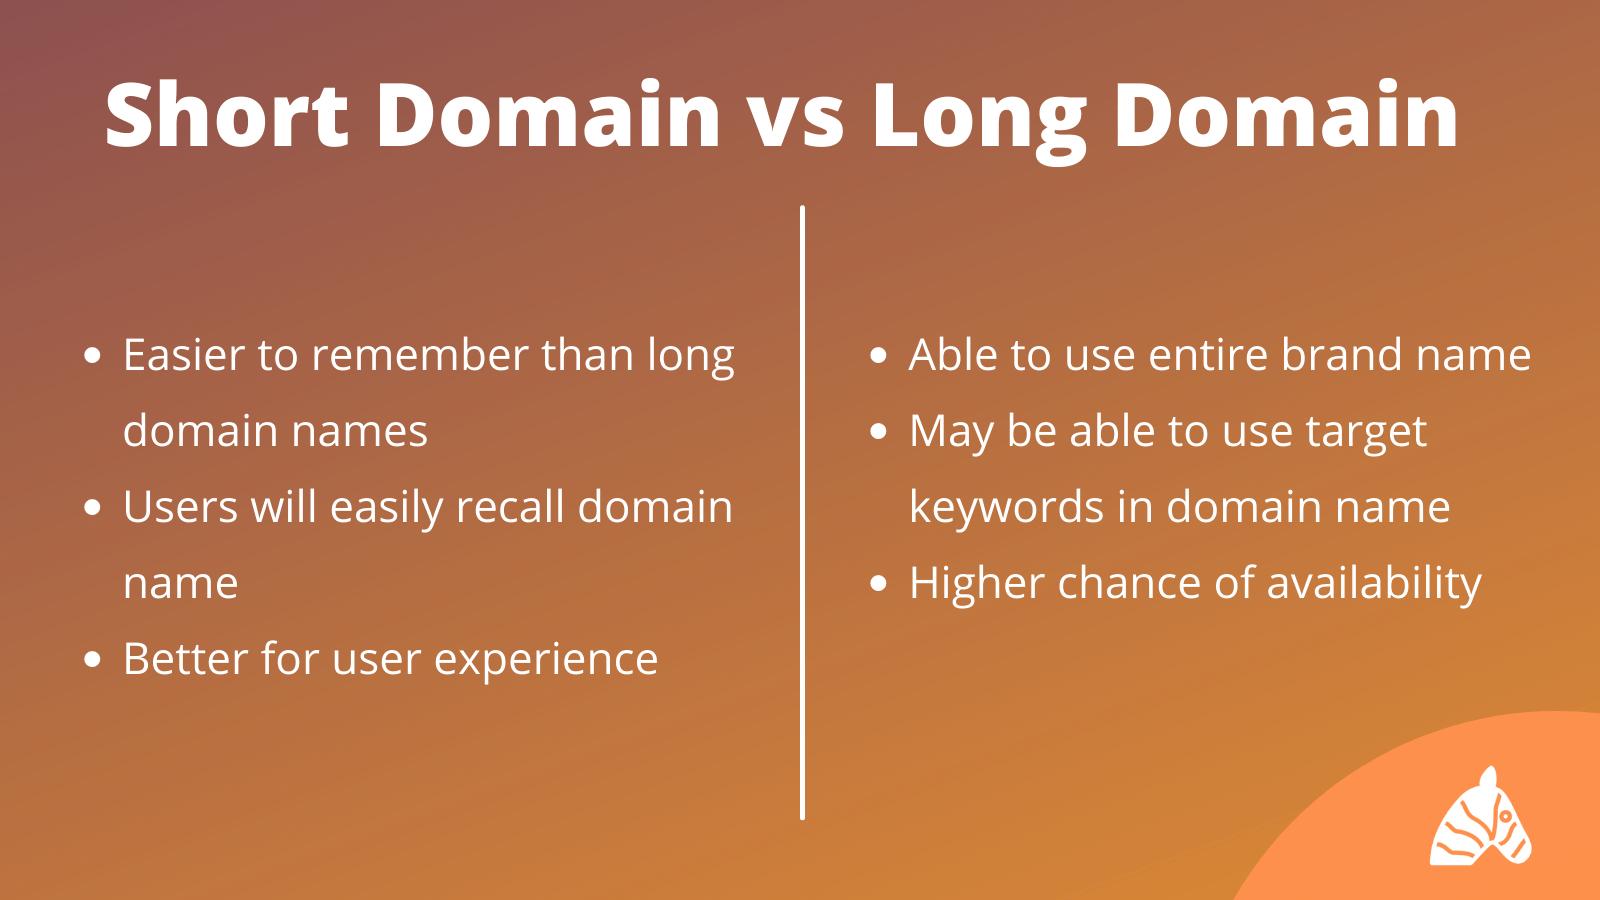 Long Domain Names vs Short Domain Names Infographic